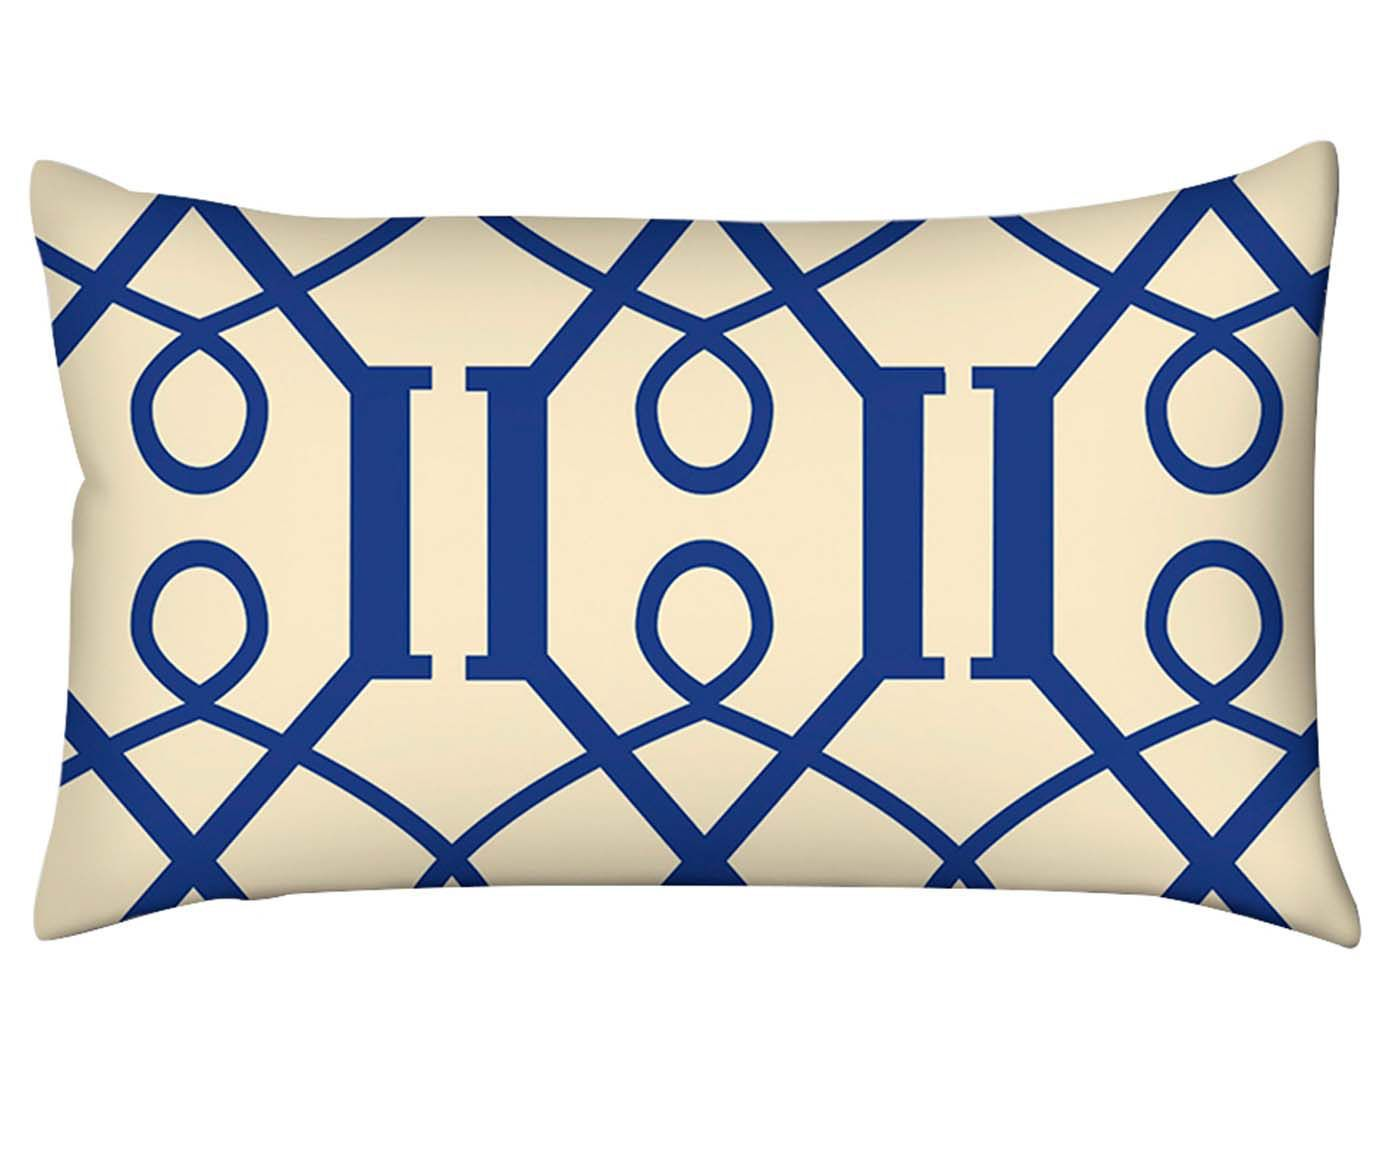 Capa para almofada marrakesh confusion zen - 20 x 38 cm | Westwing.com.br